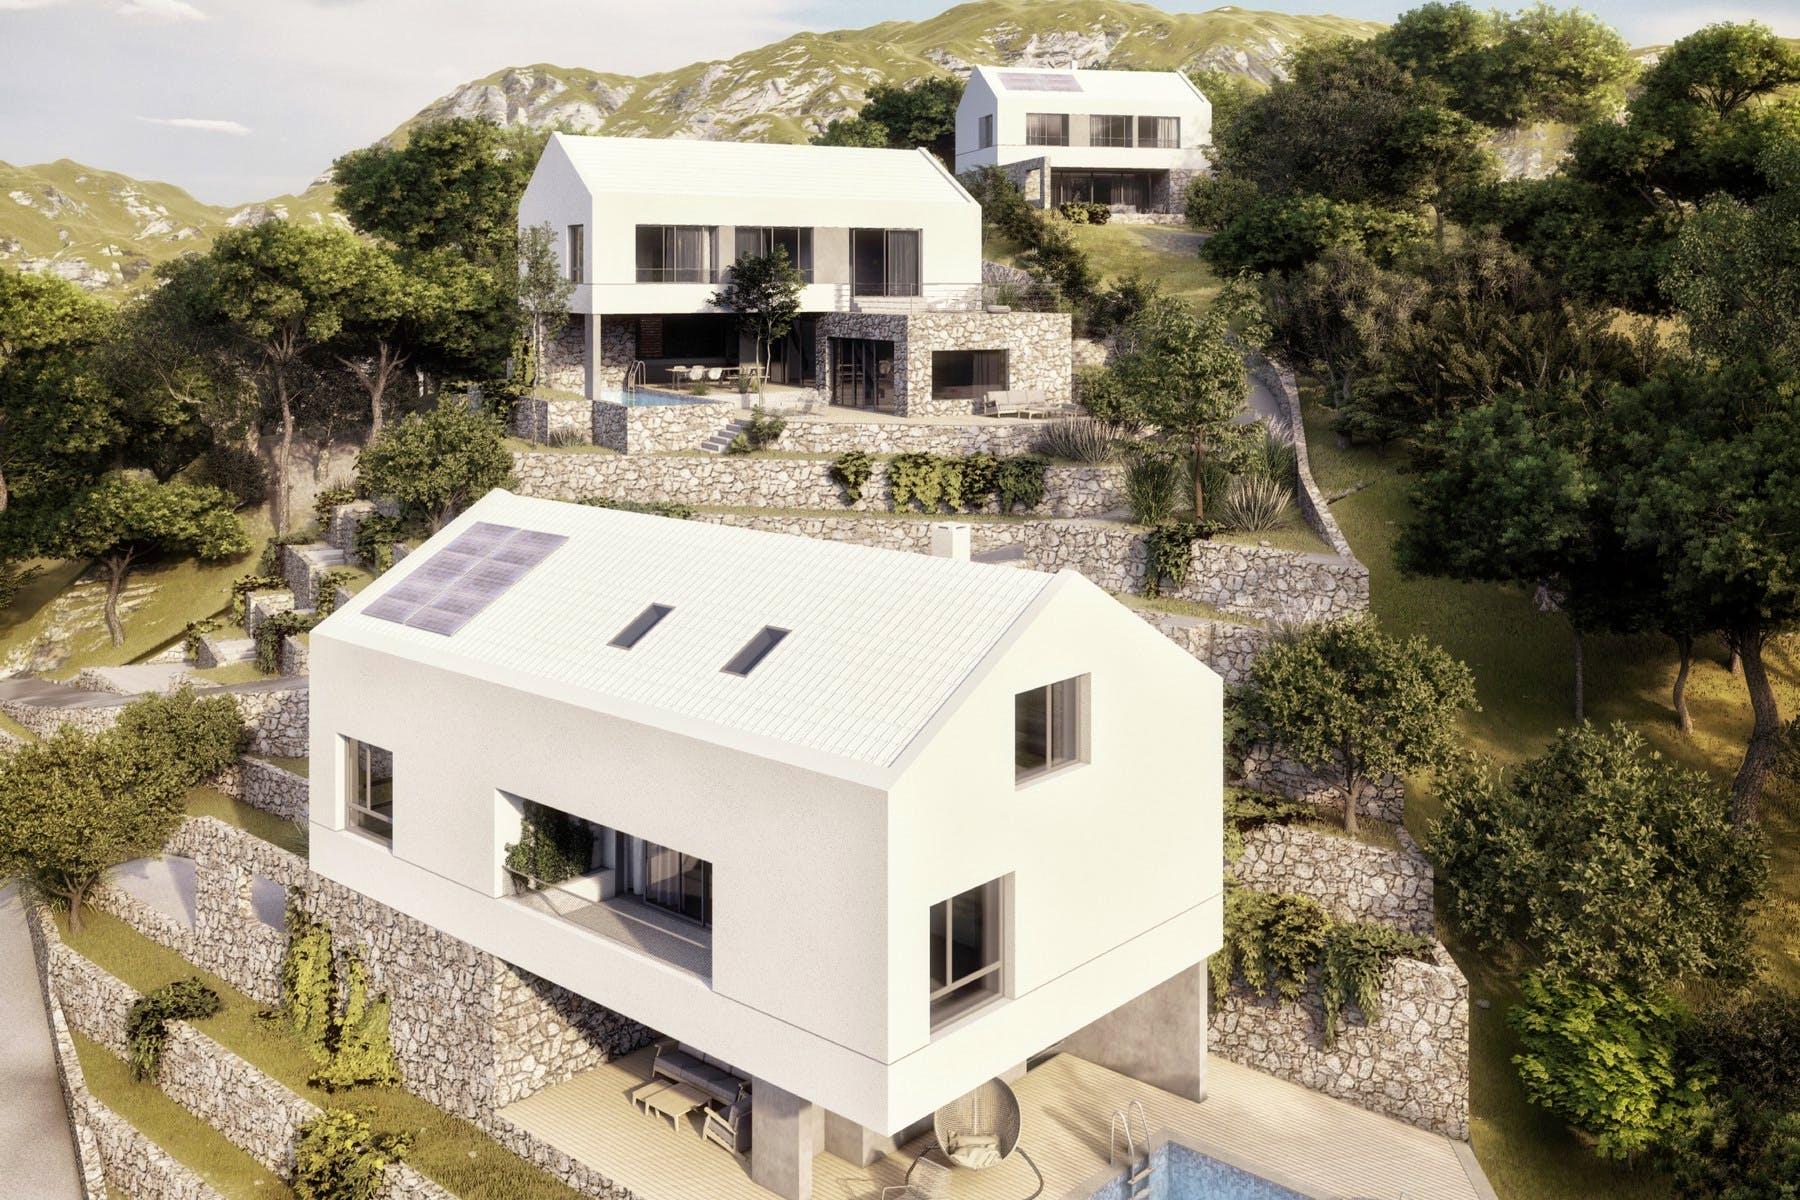 Project for 3 luxury villas